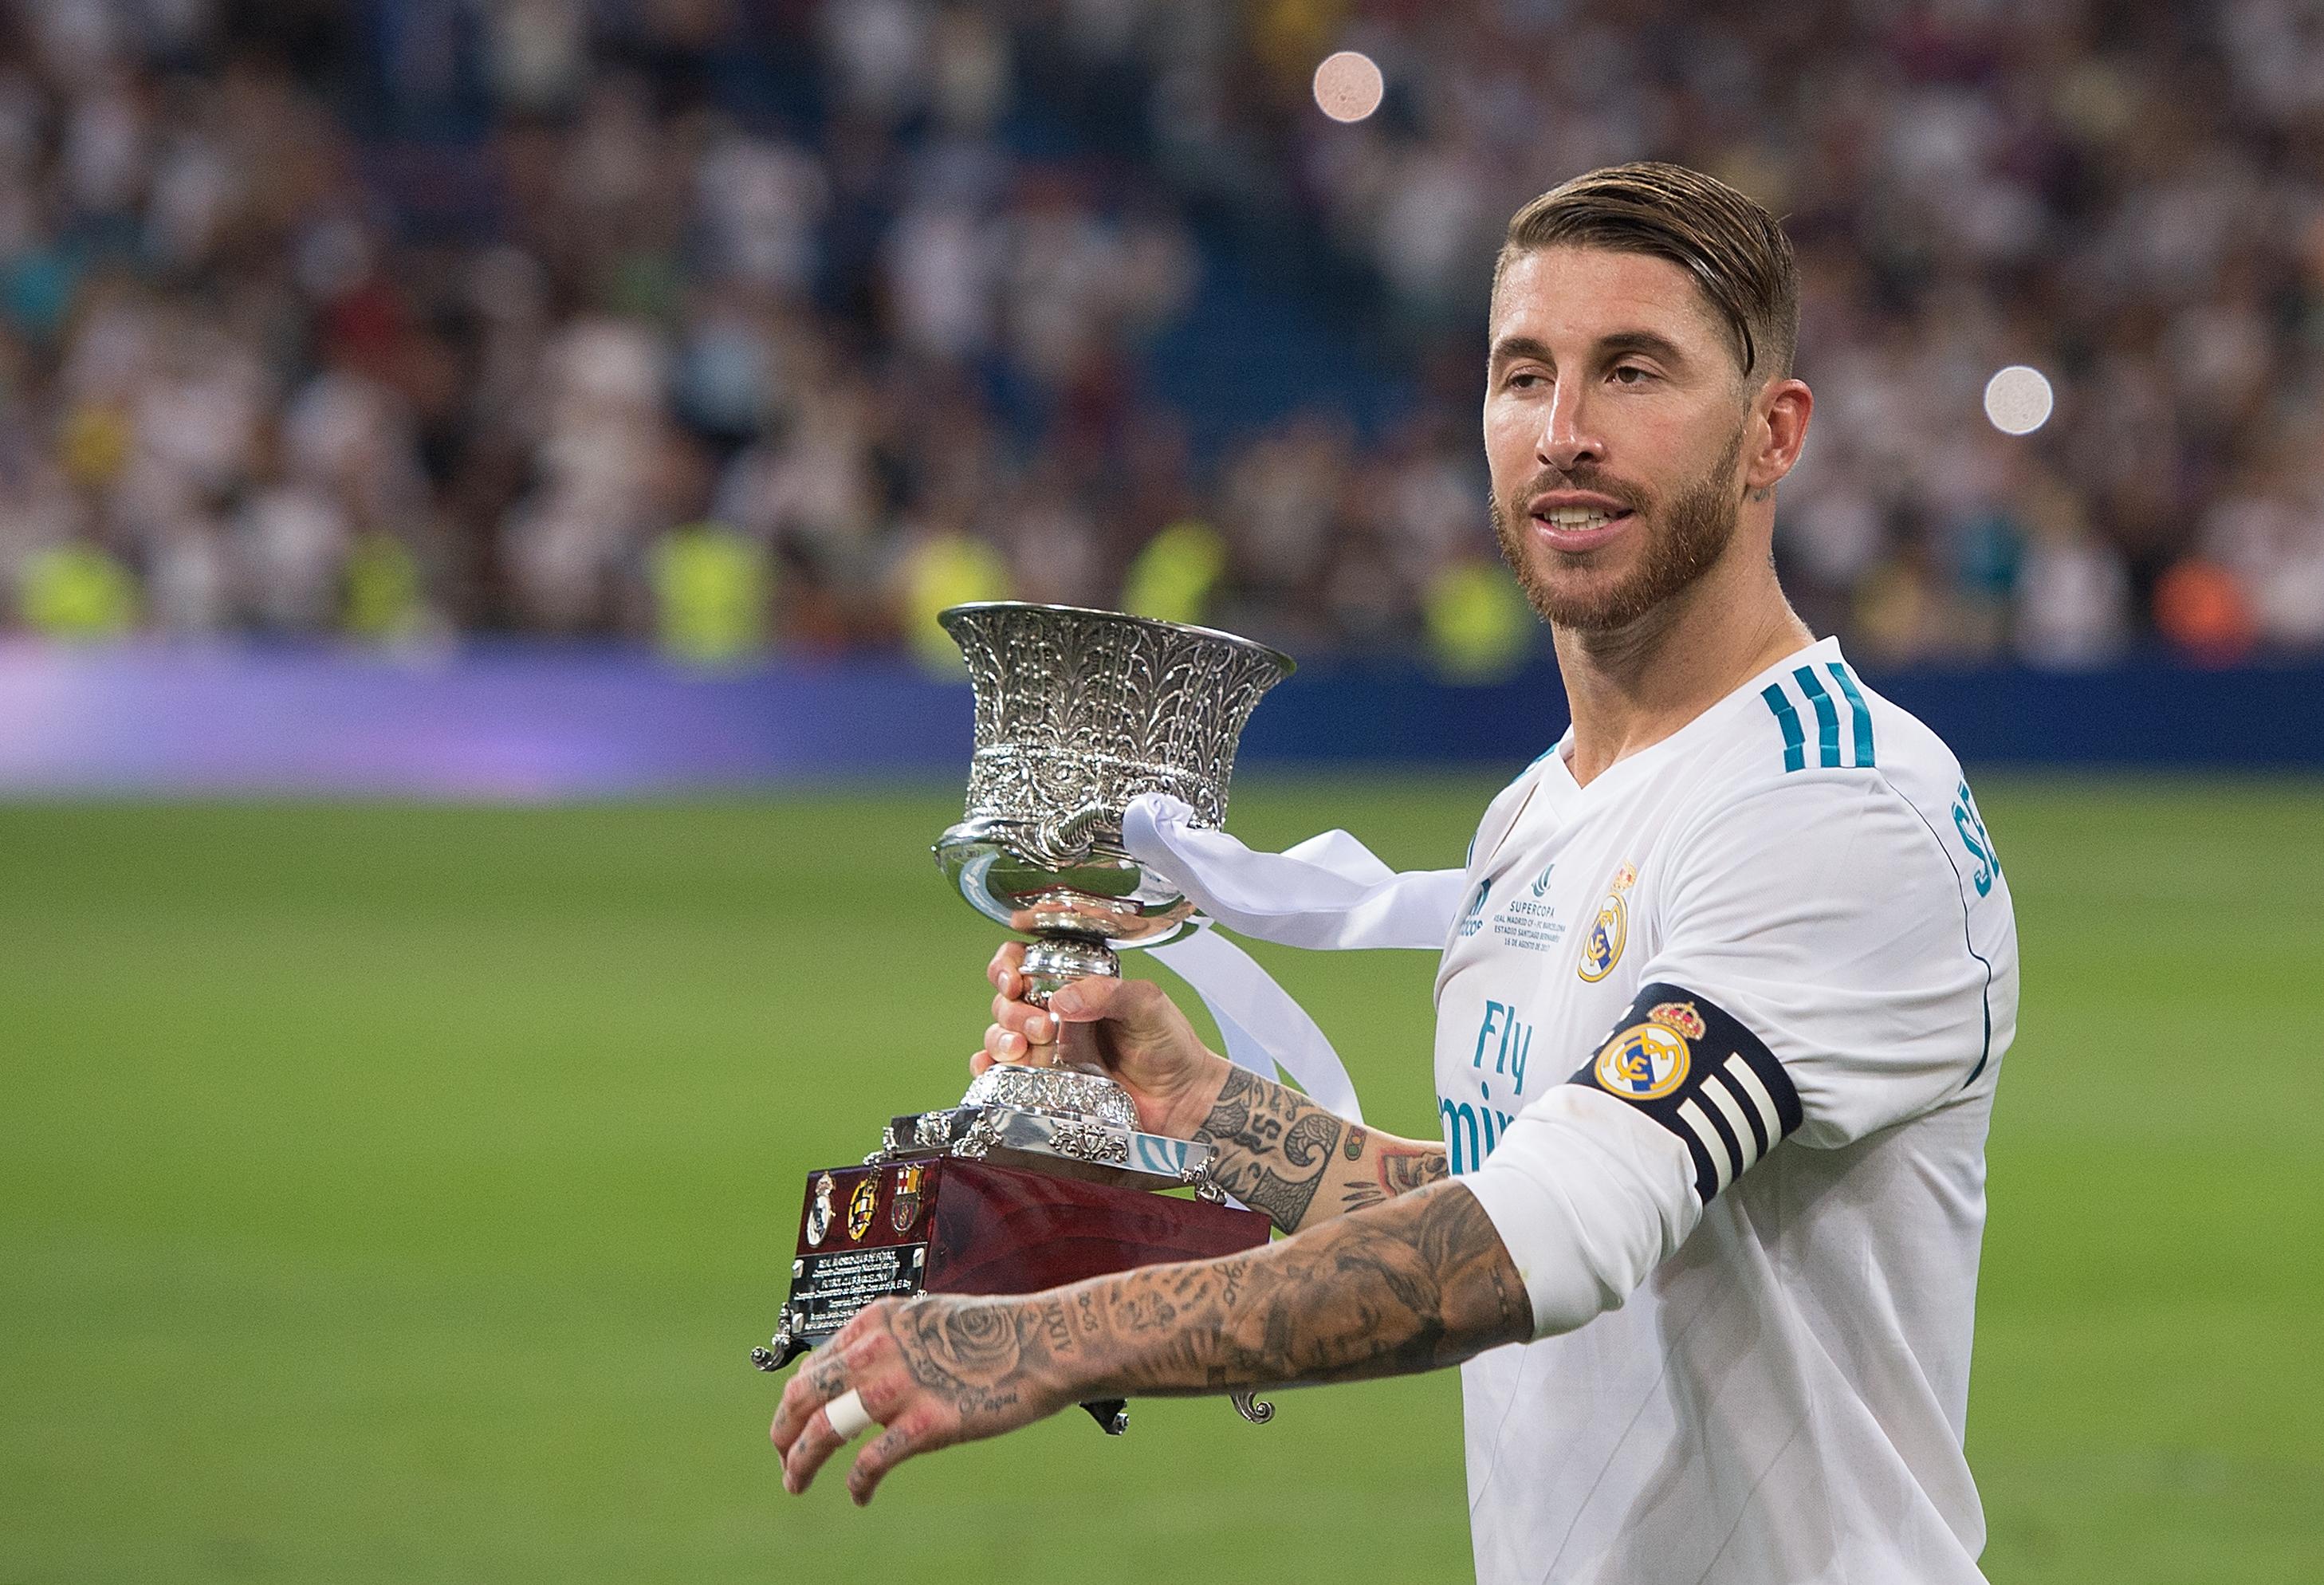 Sergio Ramos Luka Modric and Cristiano Ronaldo win UEFA